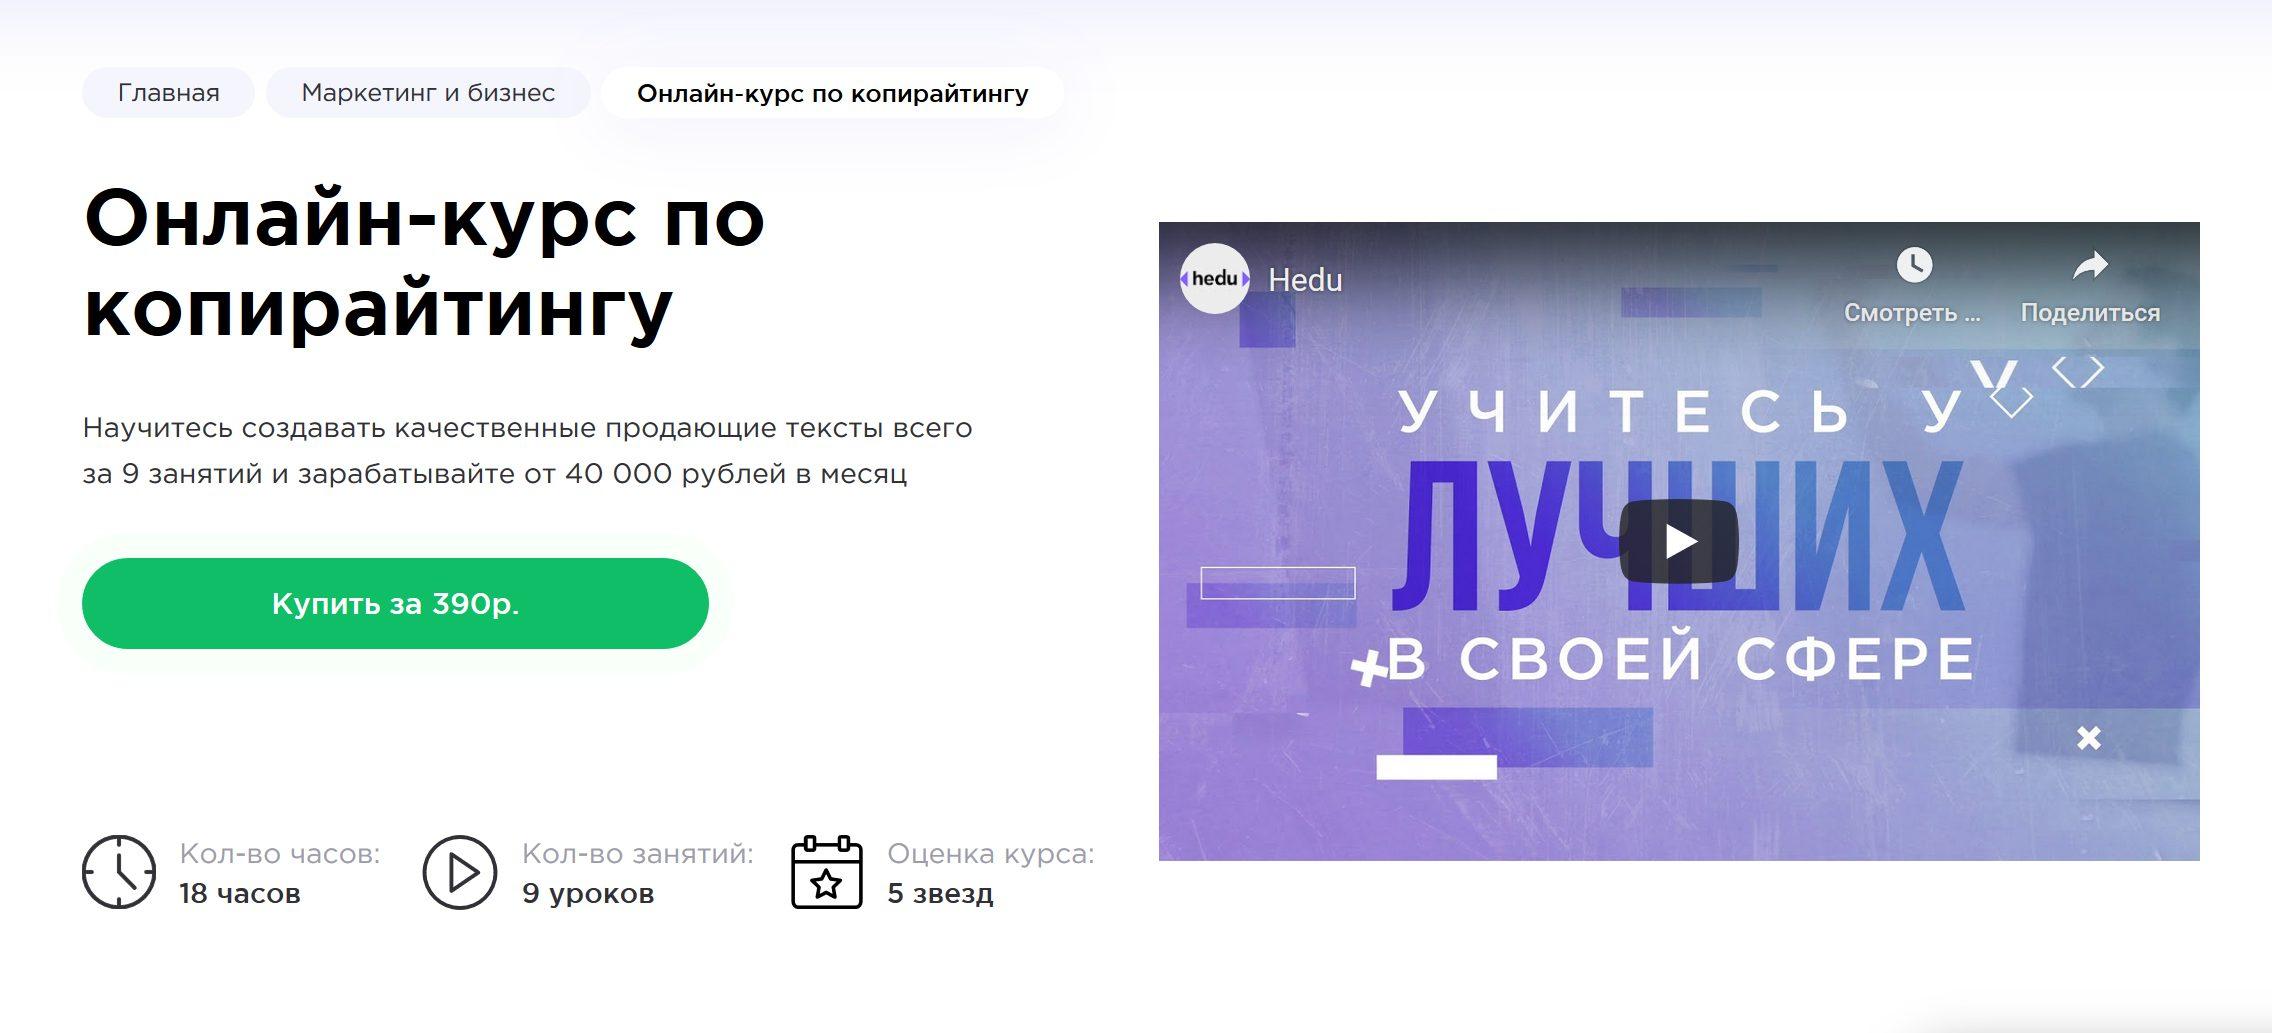 Курсы копирайтинга онлайн. Онлайн-школа HEDU - Mozilla Firefox